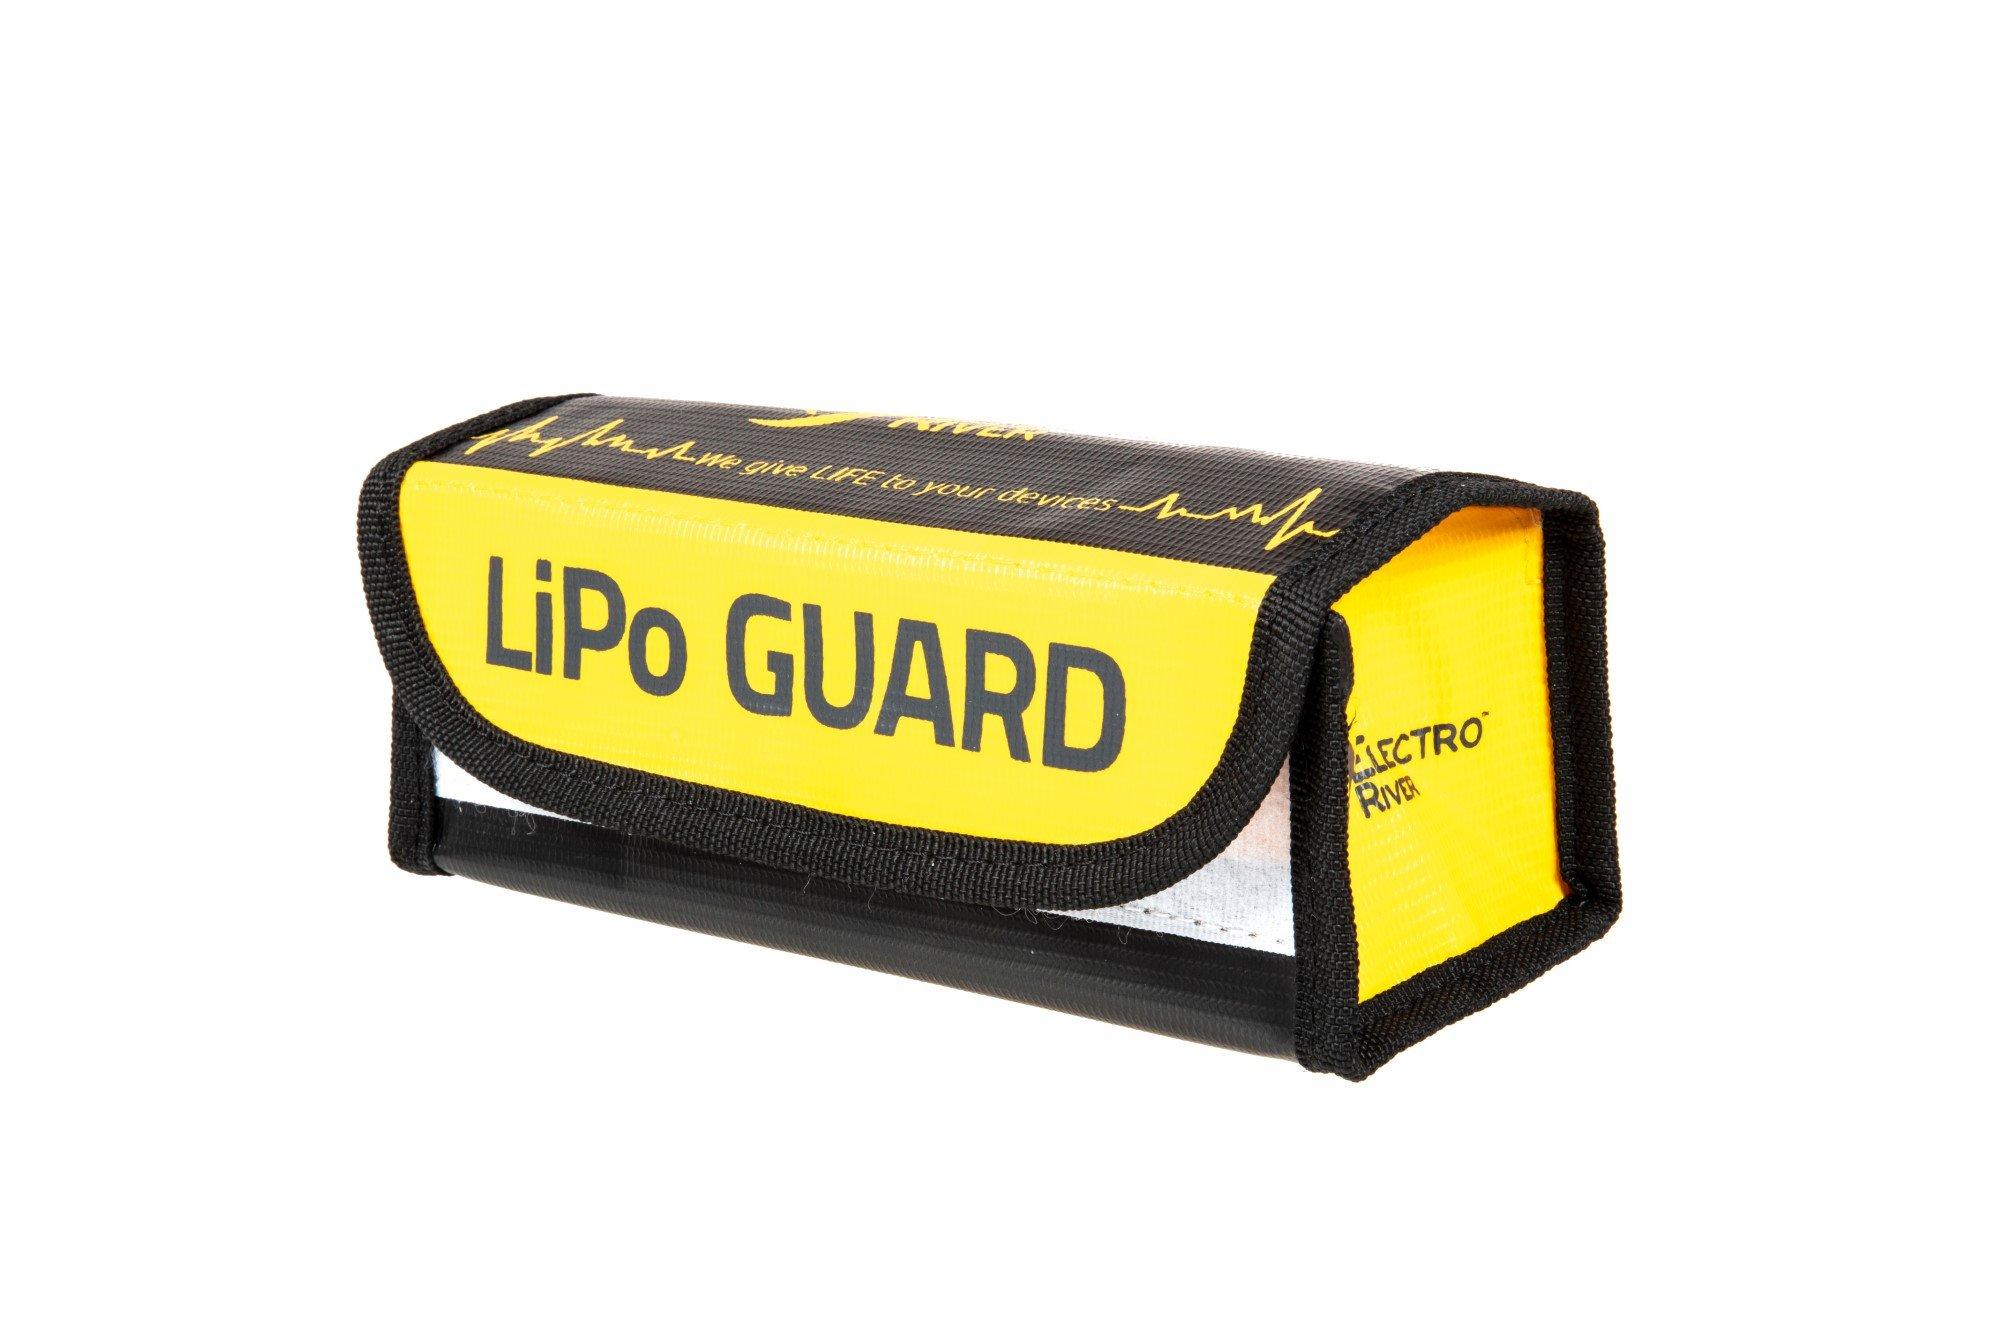 safety bag for li-po batteries